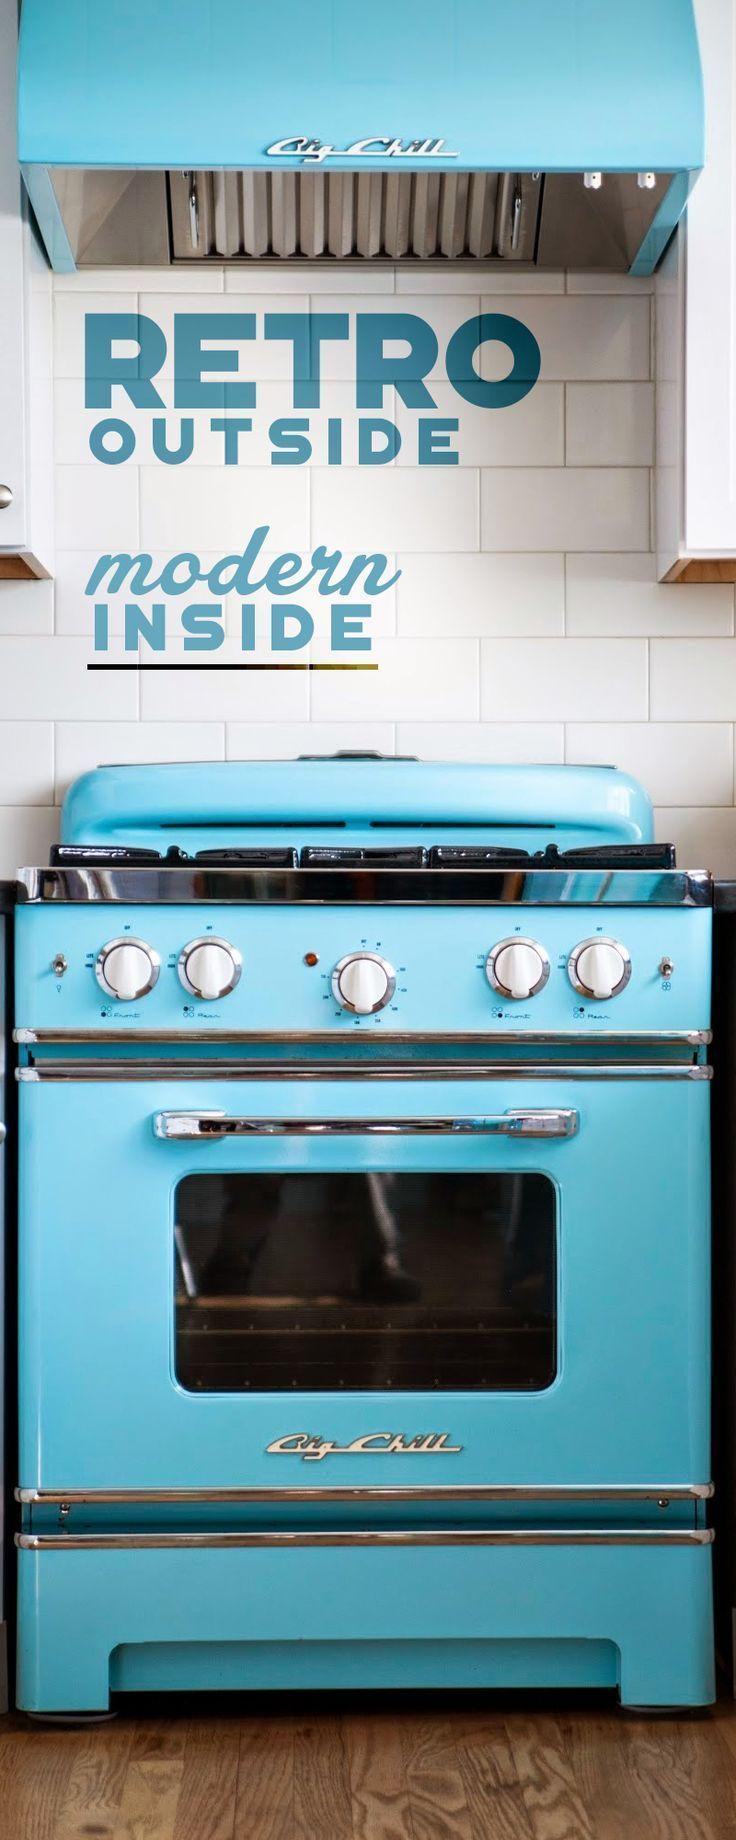 Retro and Modern Stoves, Ranges & Ovens | Retro appliances, Retro ...